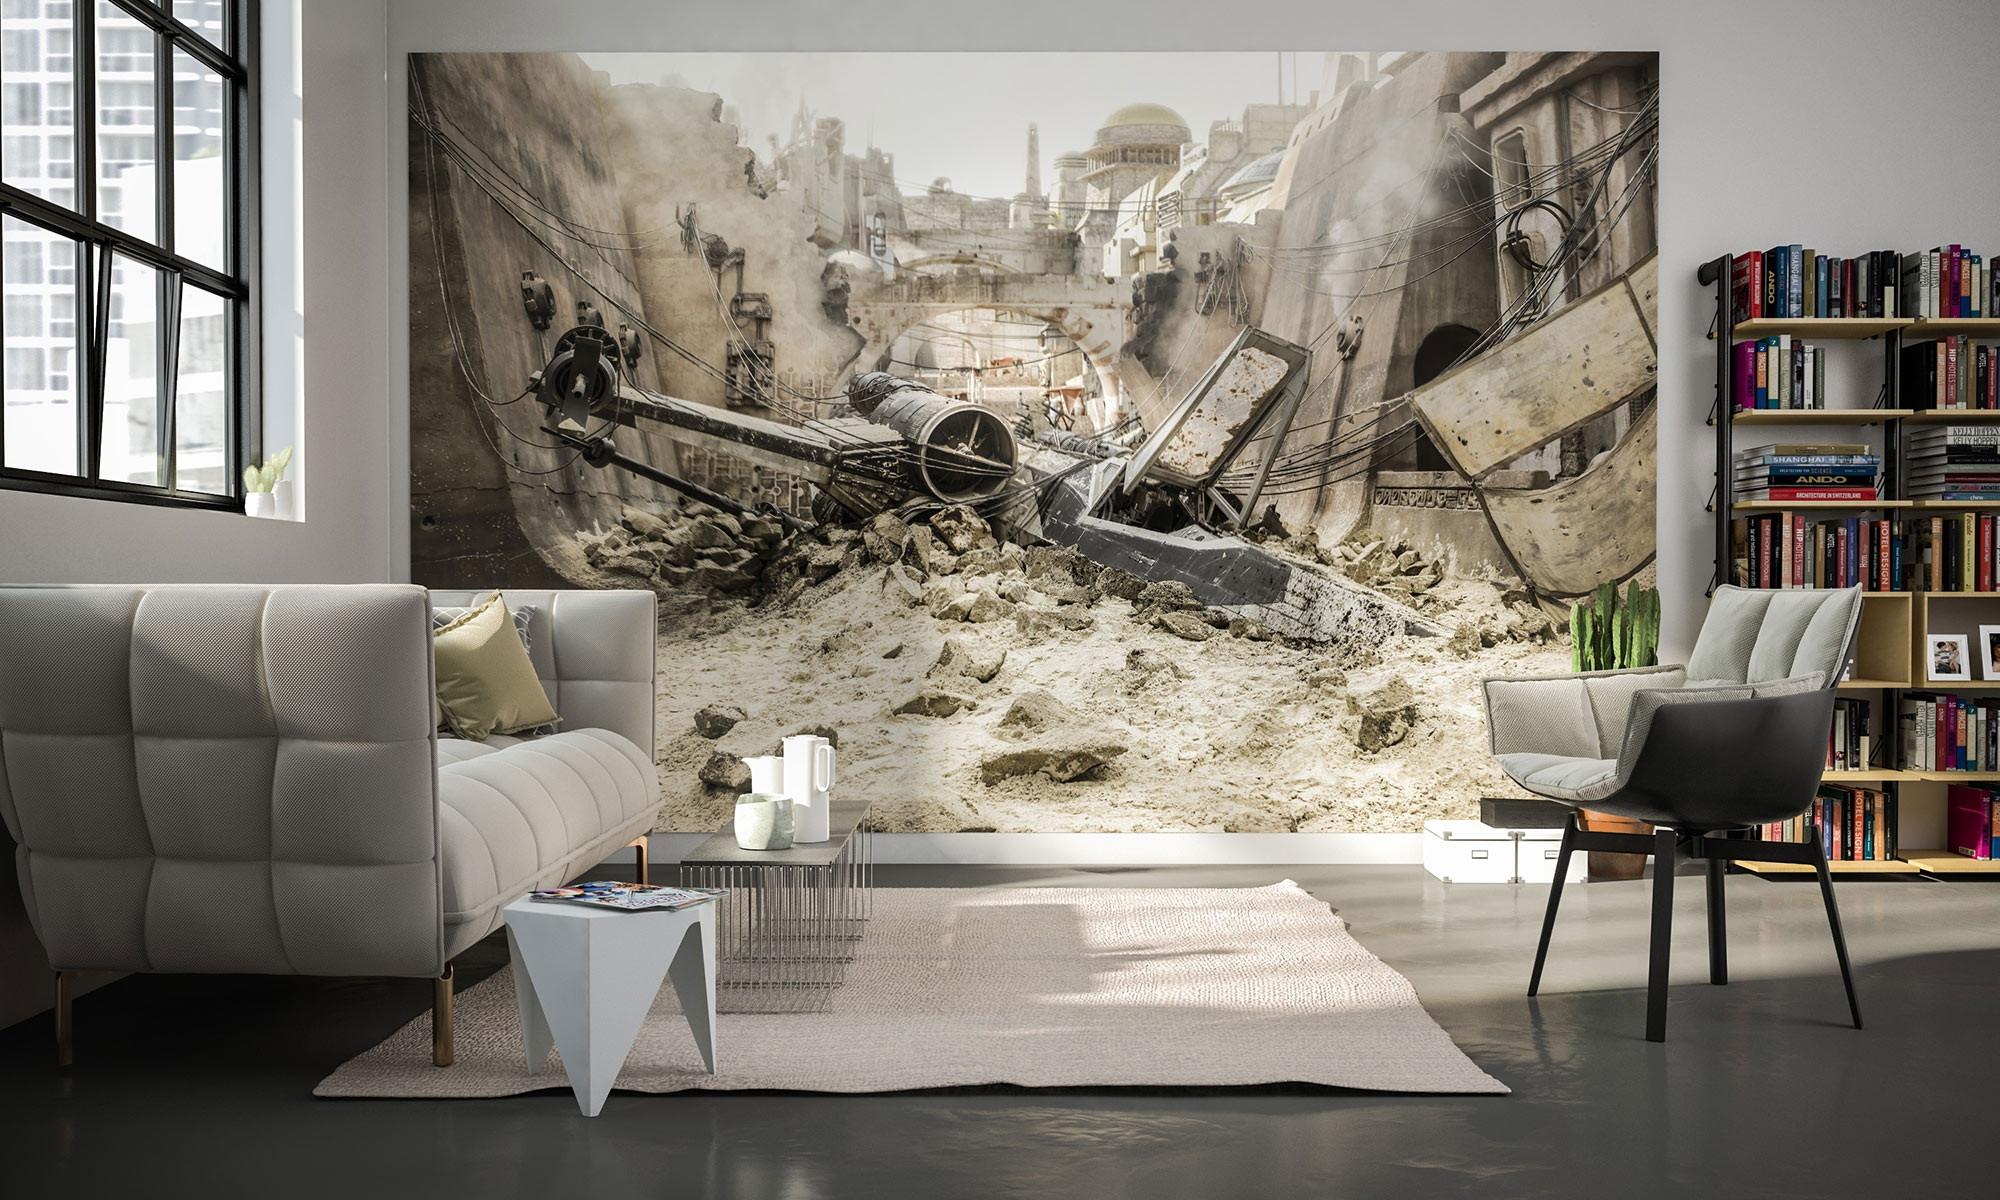 Vliestapete Star Wars XWing von Komar  fototapetede